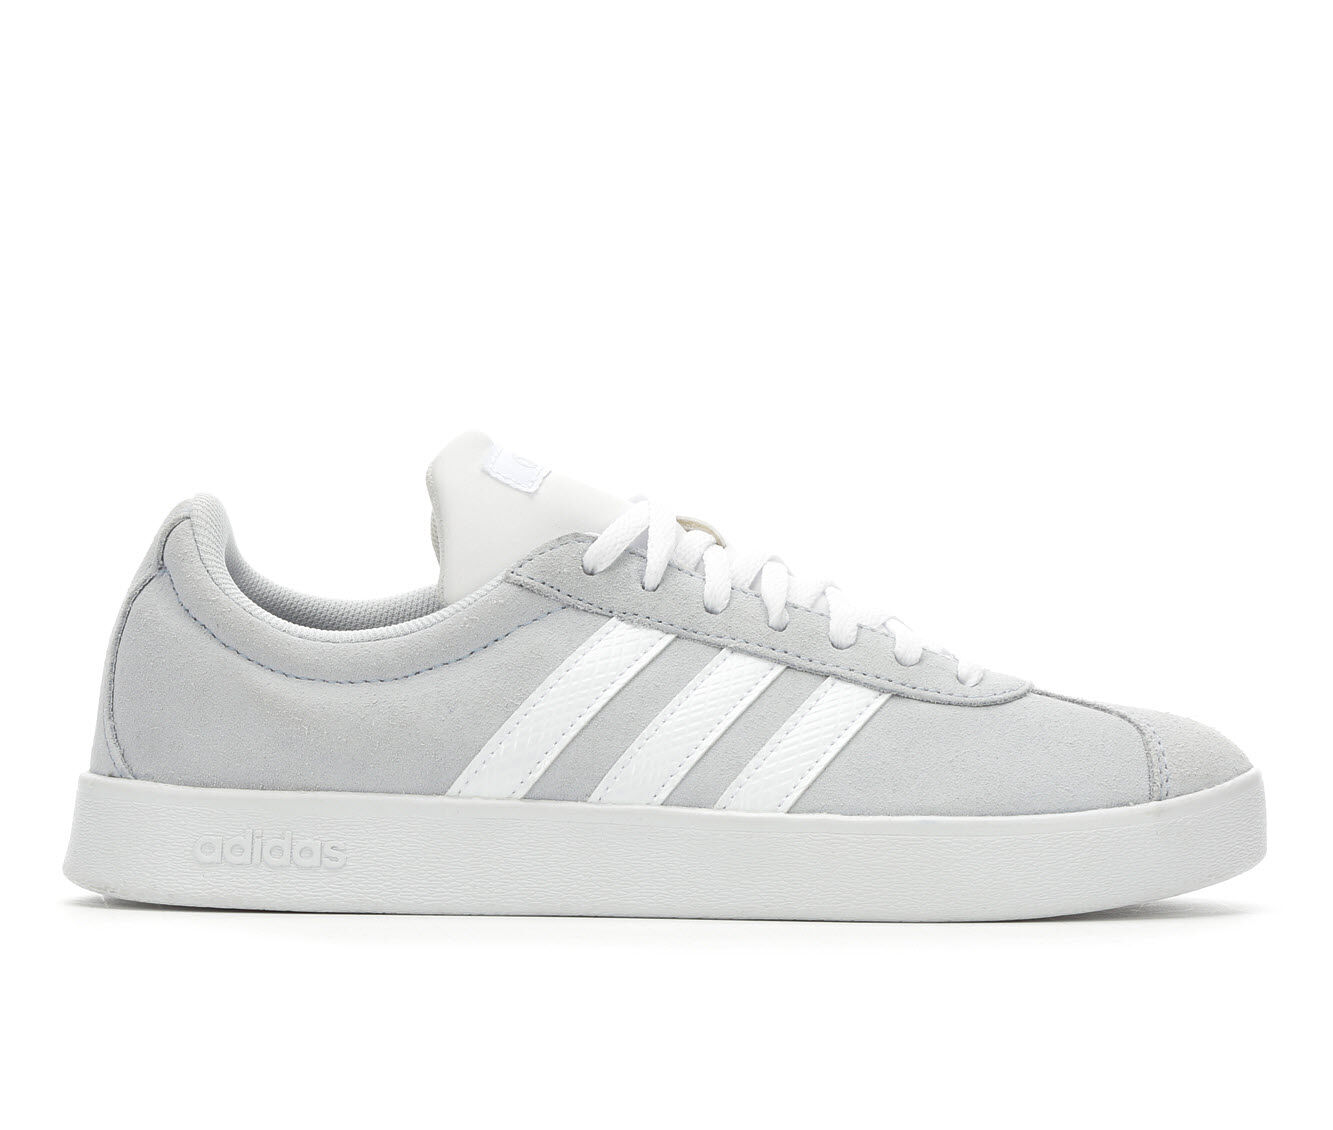 Women's Adidas VL Court 2.0 Tennis Shoes Blue/White/Gry